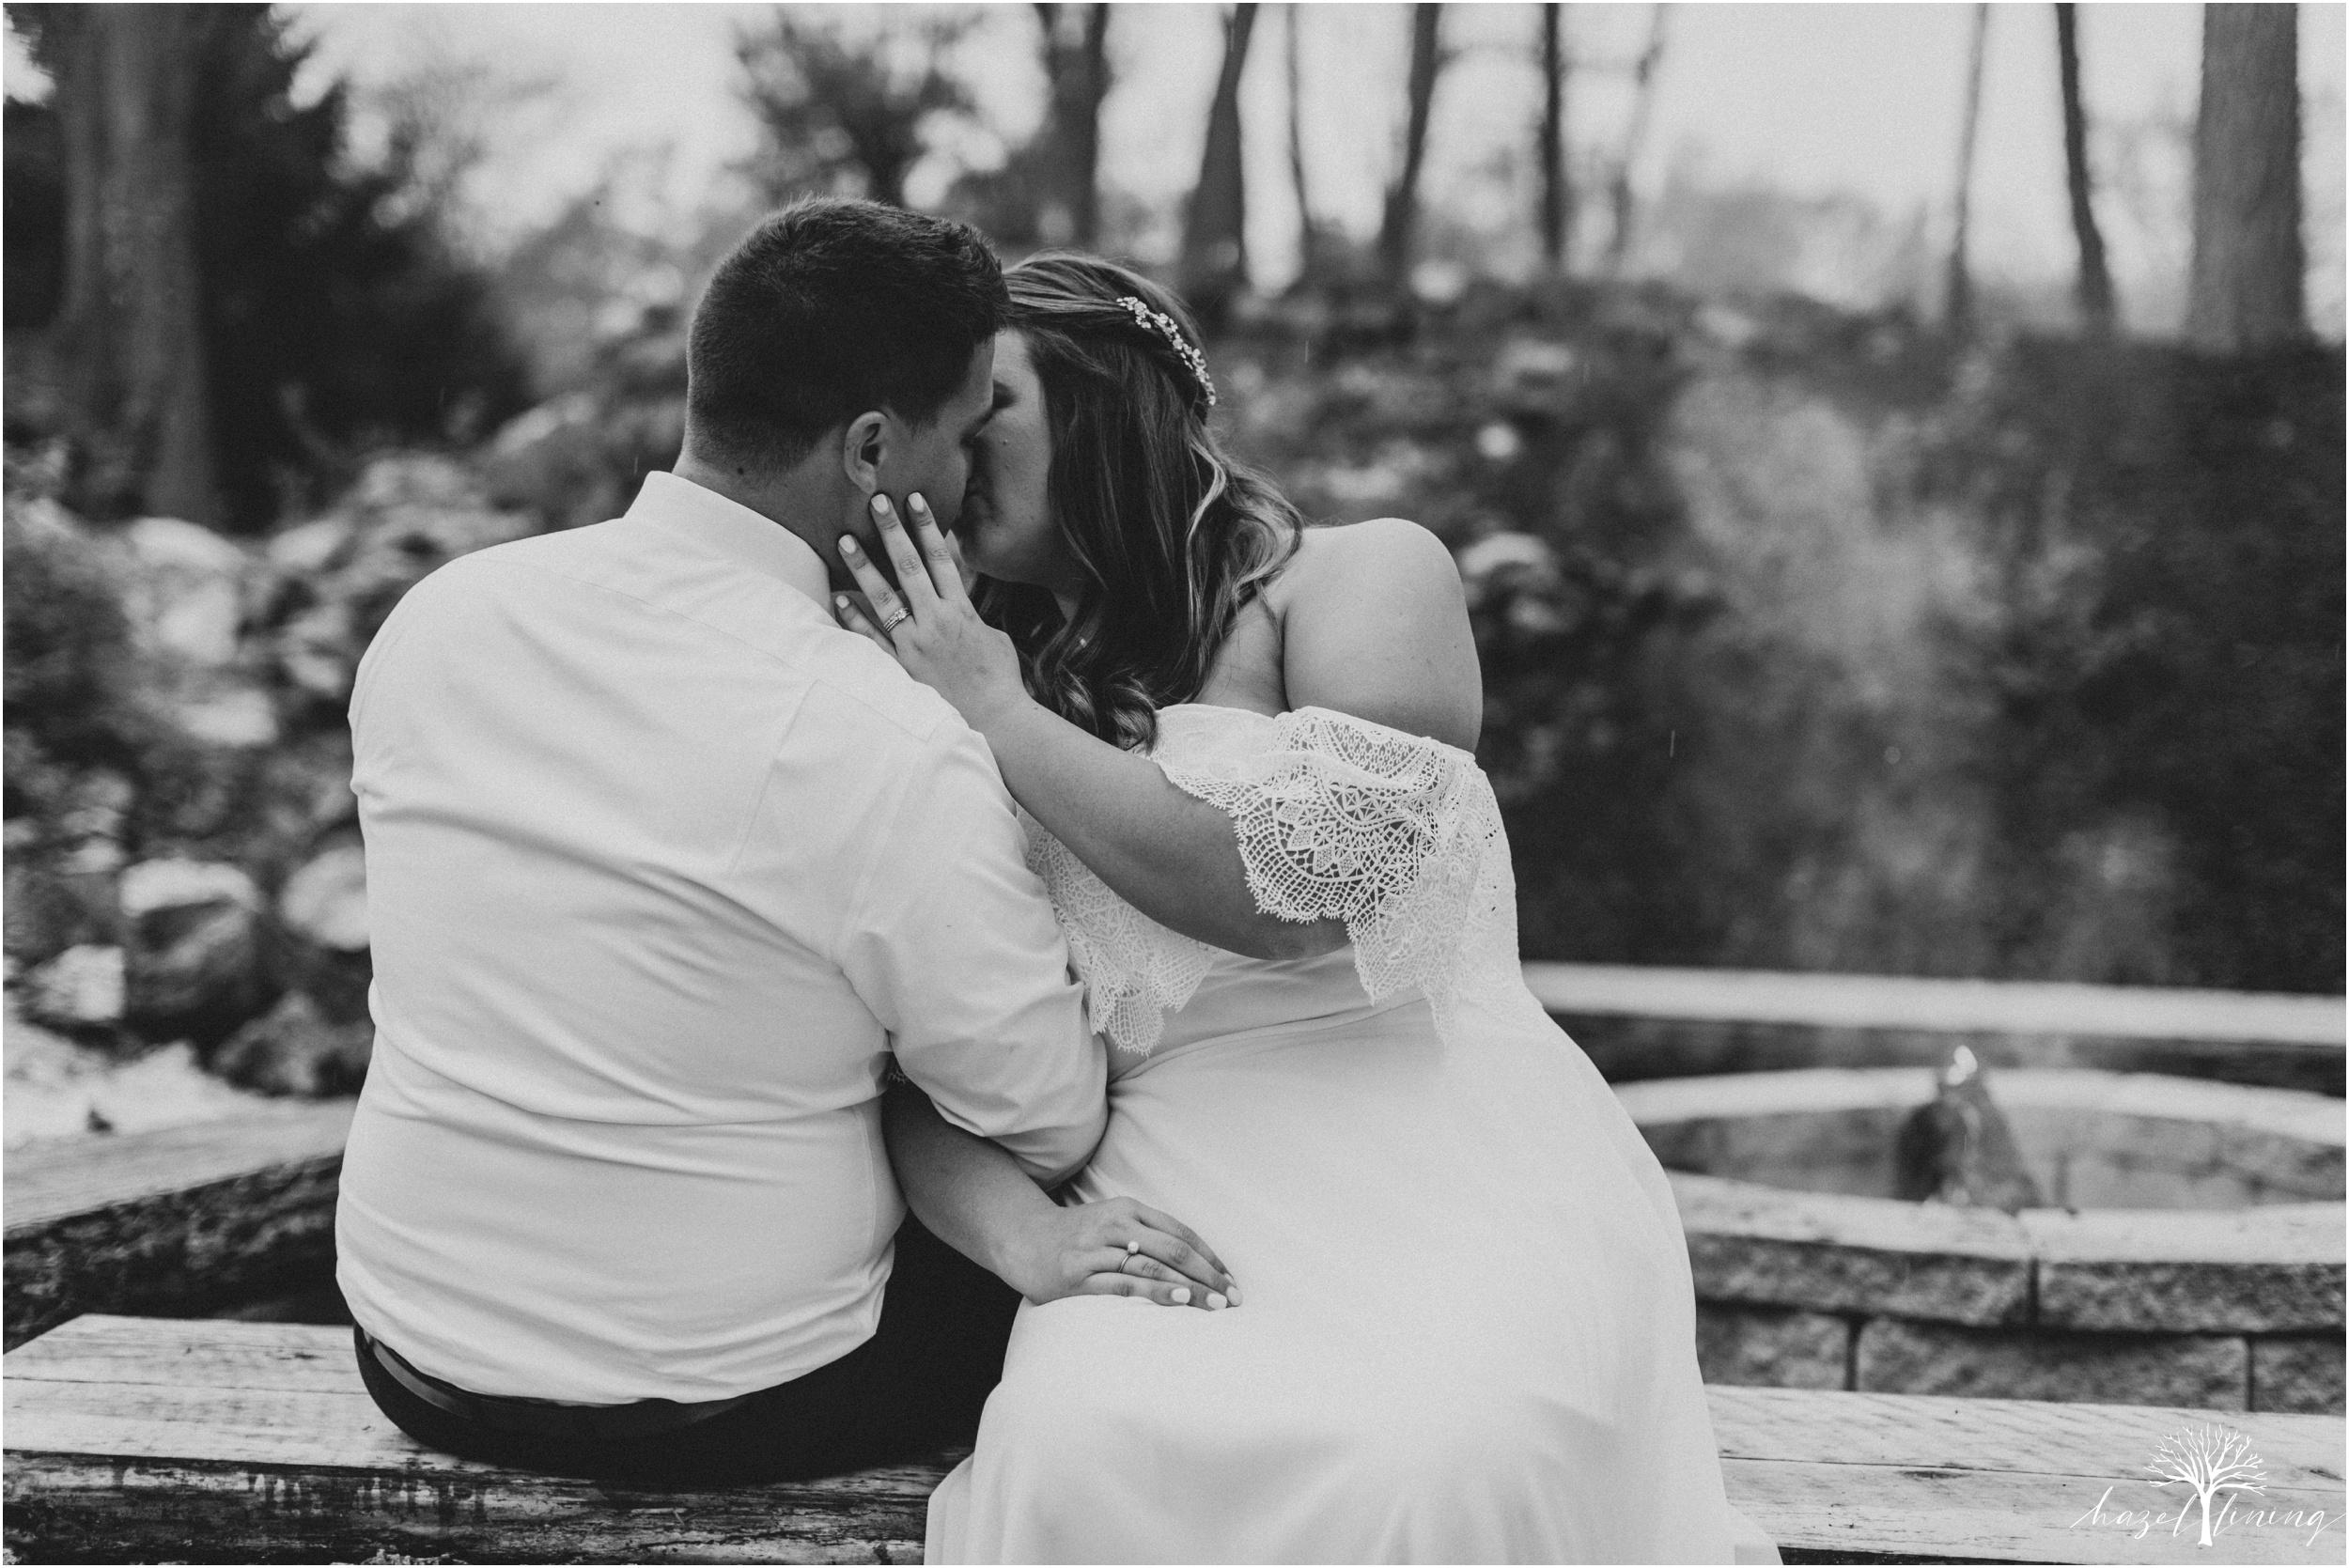 hazel-lining-travel-wedding-elopement-photography-abby-skyler-hunt-the-willis-house-york-pennsylvania-outdoor-estate-wedding_0127.jpg